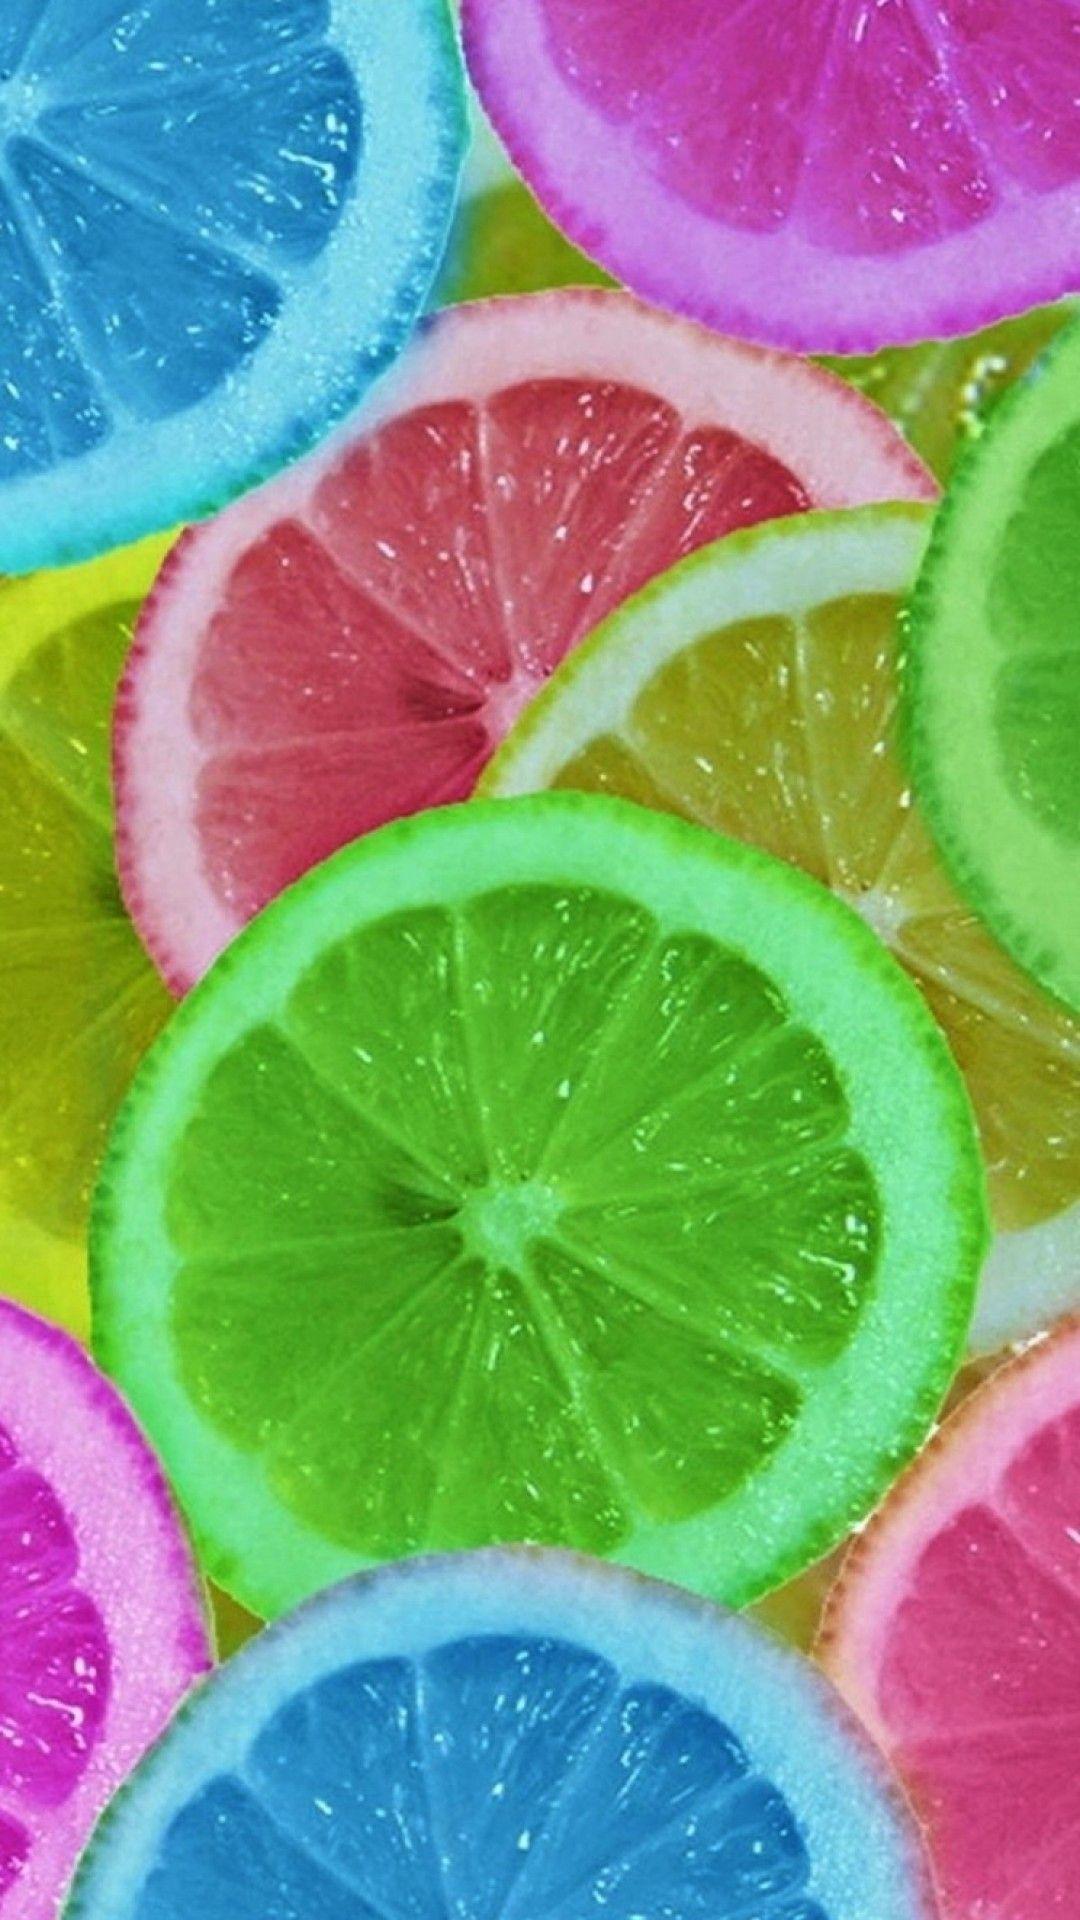 ☺iphone 7 wallpaper HD168 Limoni colorati, Sfondi